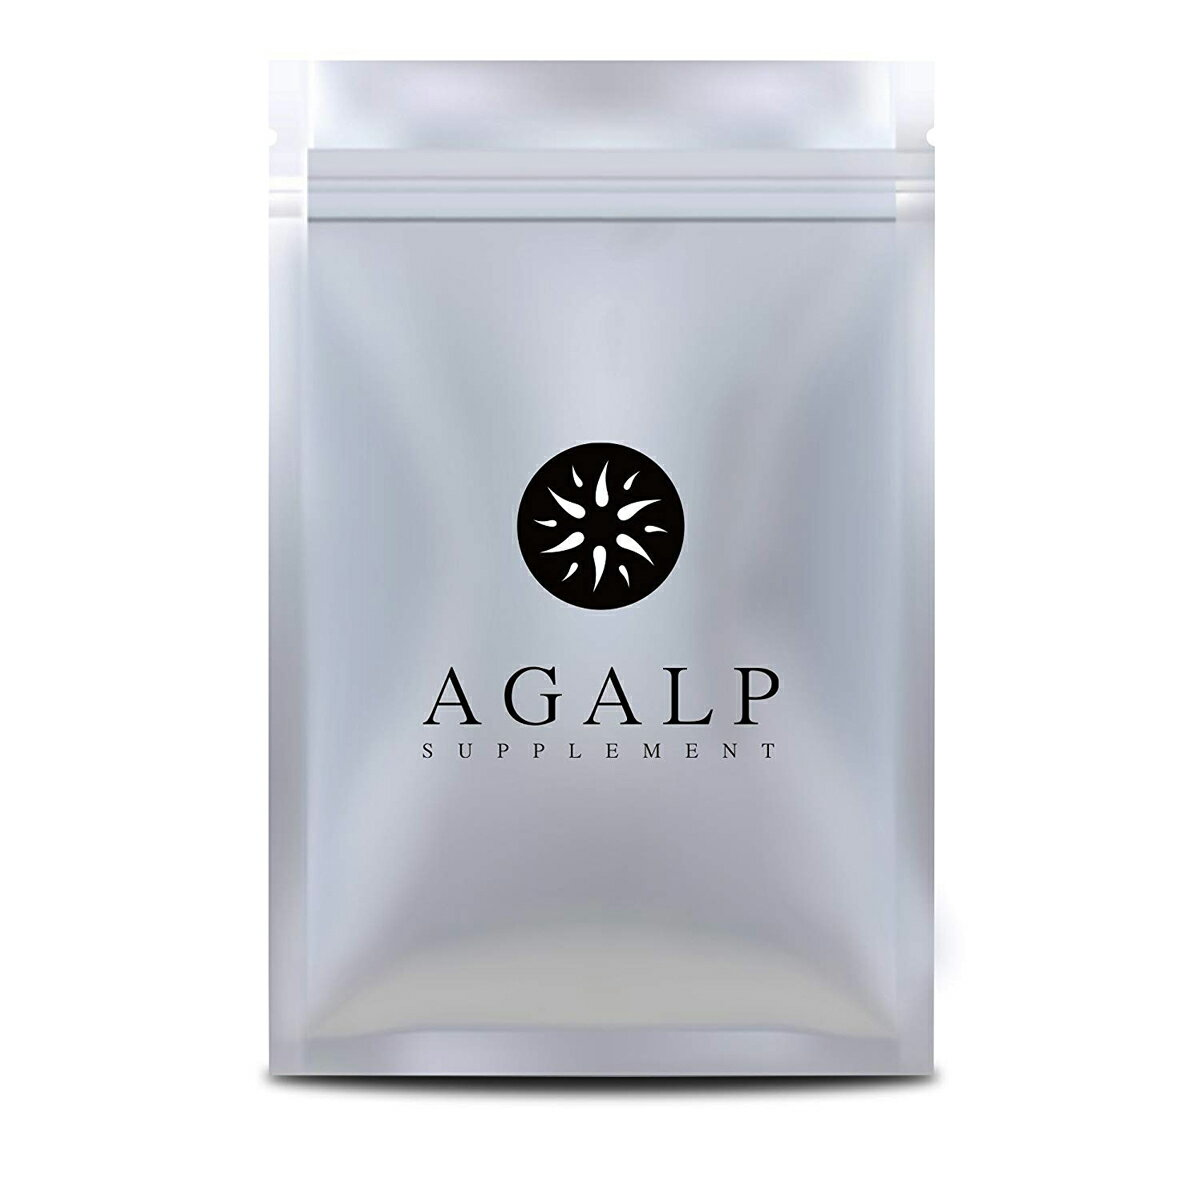 AGALP 育毛 サプリ ノコギリヤシ 亜鉛 育毛 発毛 薄毛 抜け毛 120粒×1袋